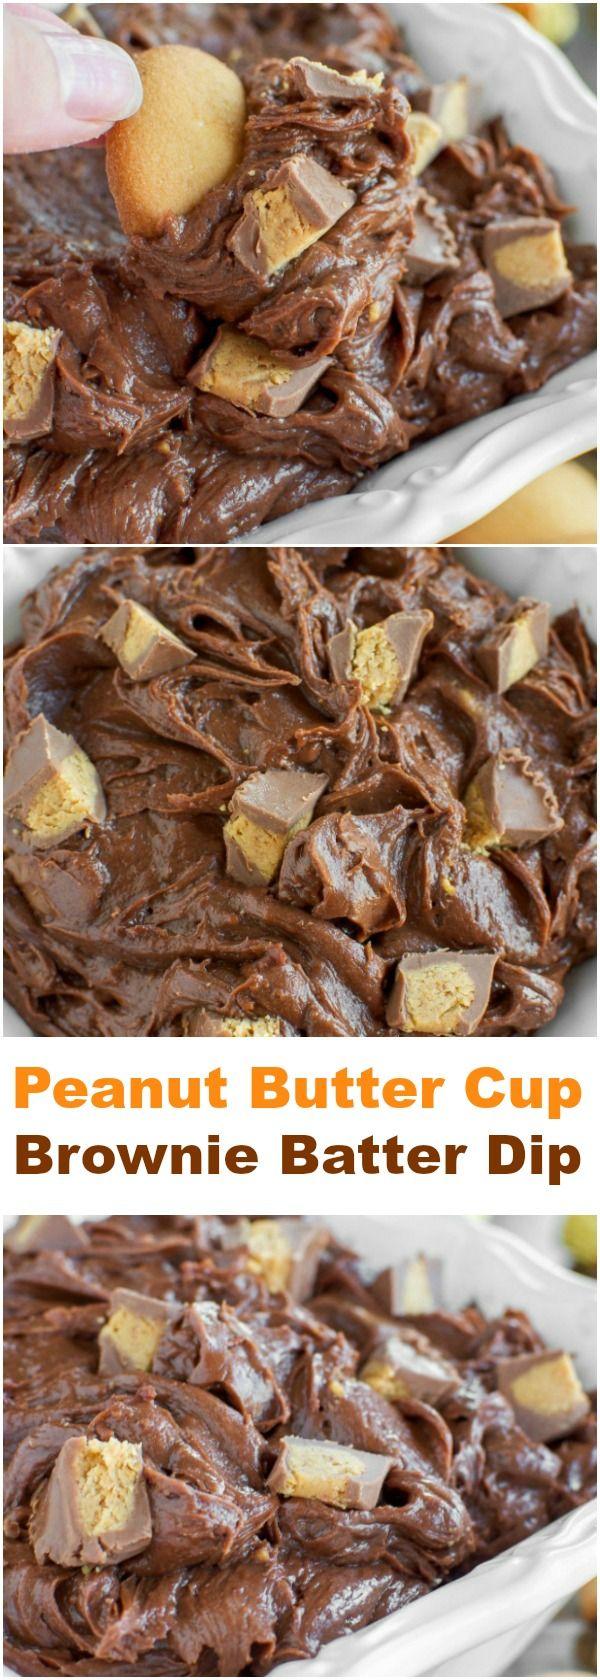 INCREDIBLE Peanut Butter Cup Brownie Batter Dip!!!